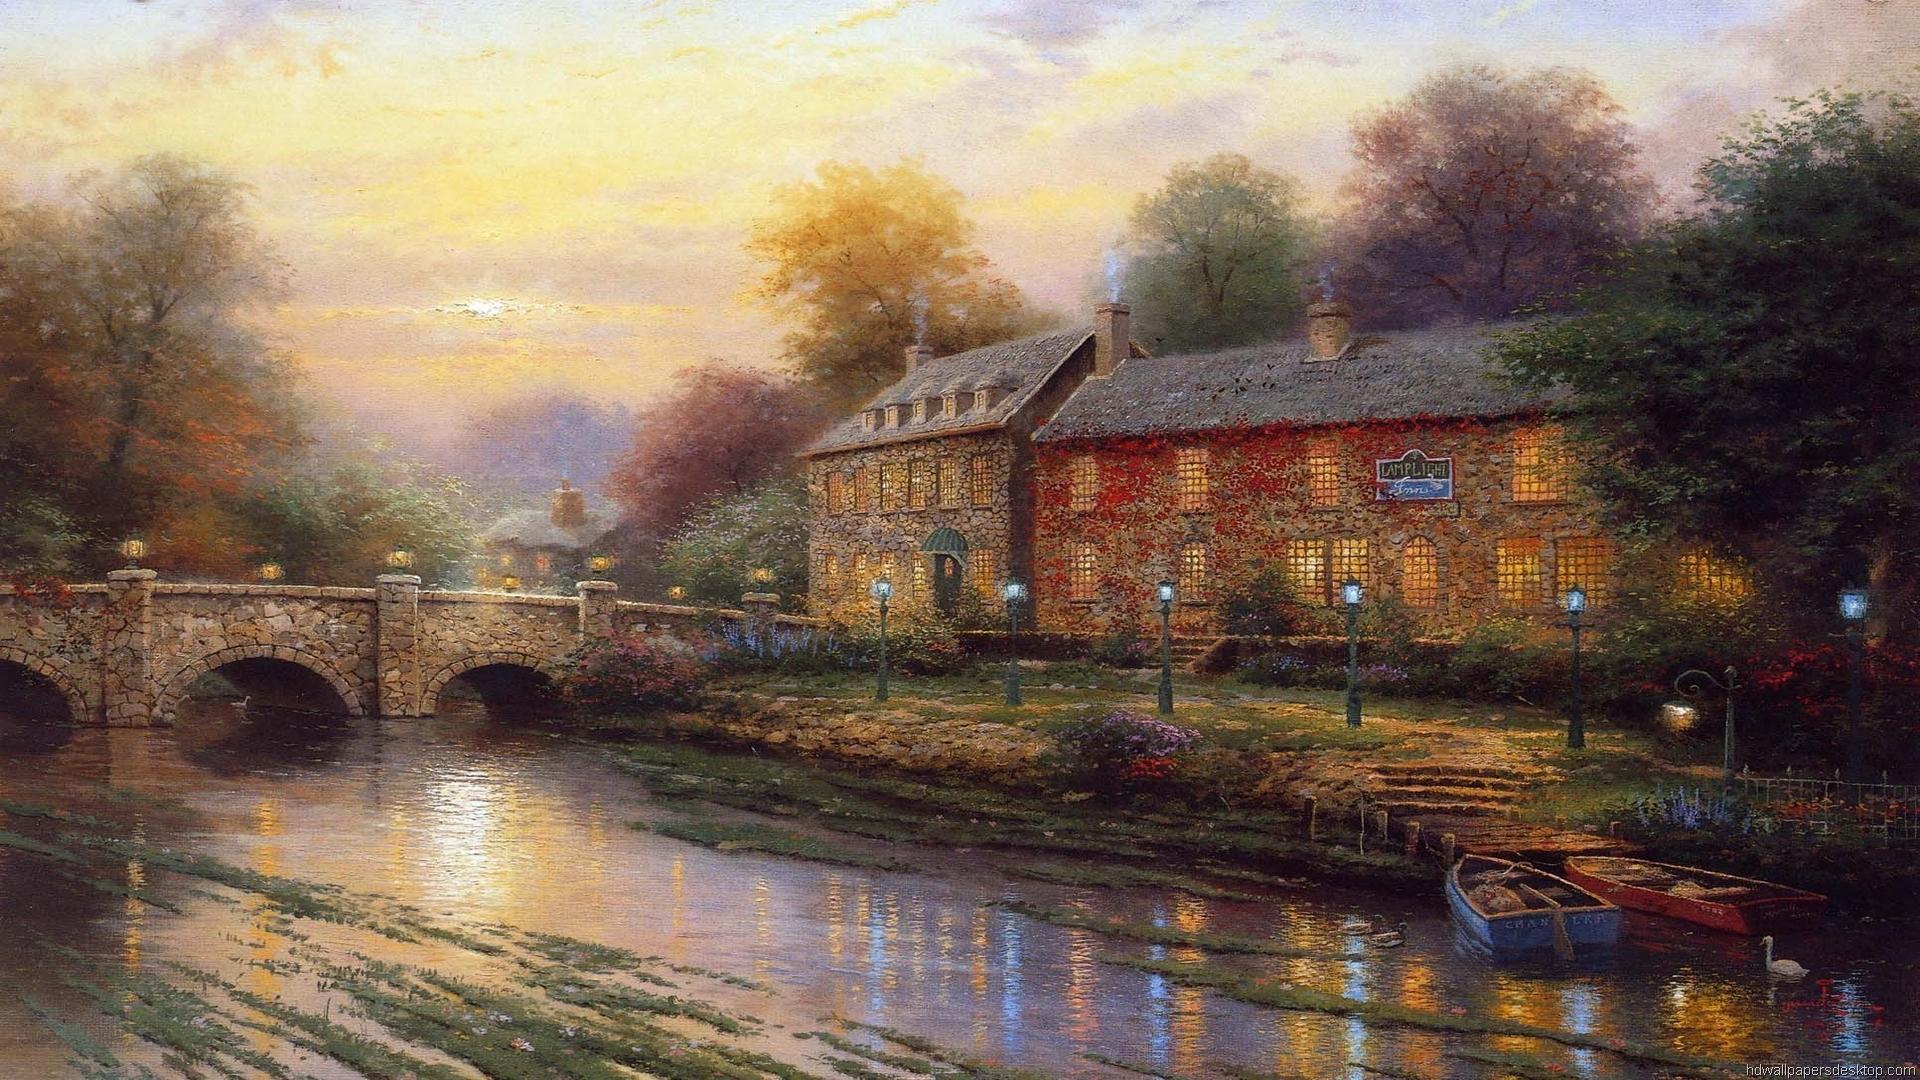 Thomas Kinkade Art Bridge Christmas Holiday Painting Picture 1920x1080